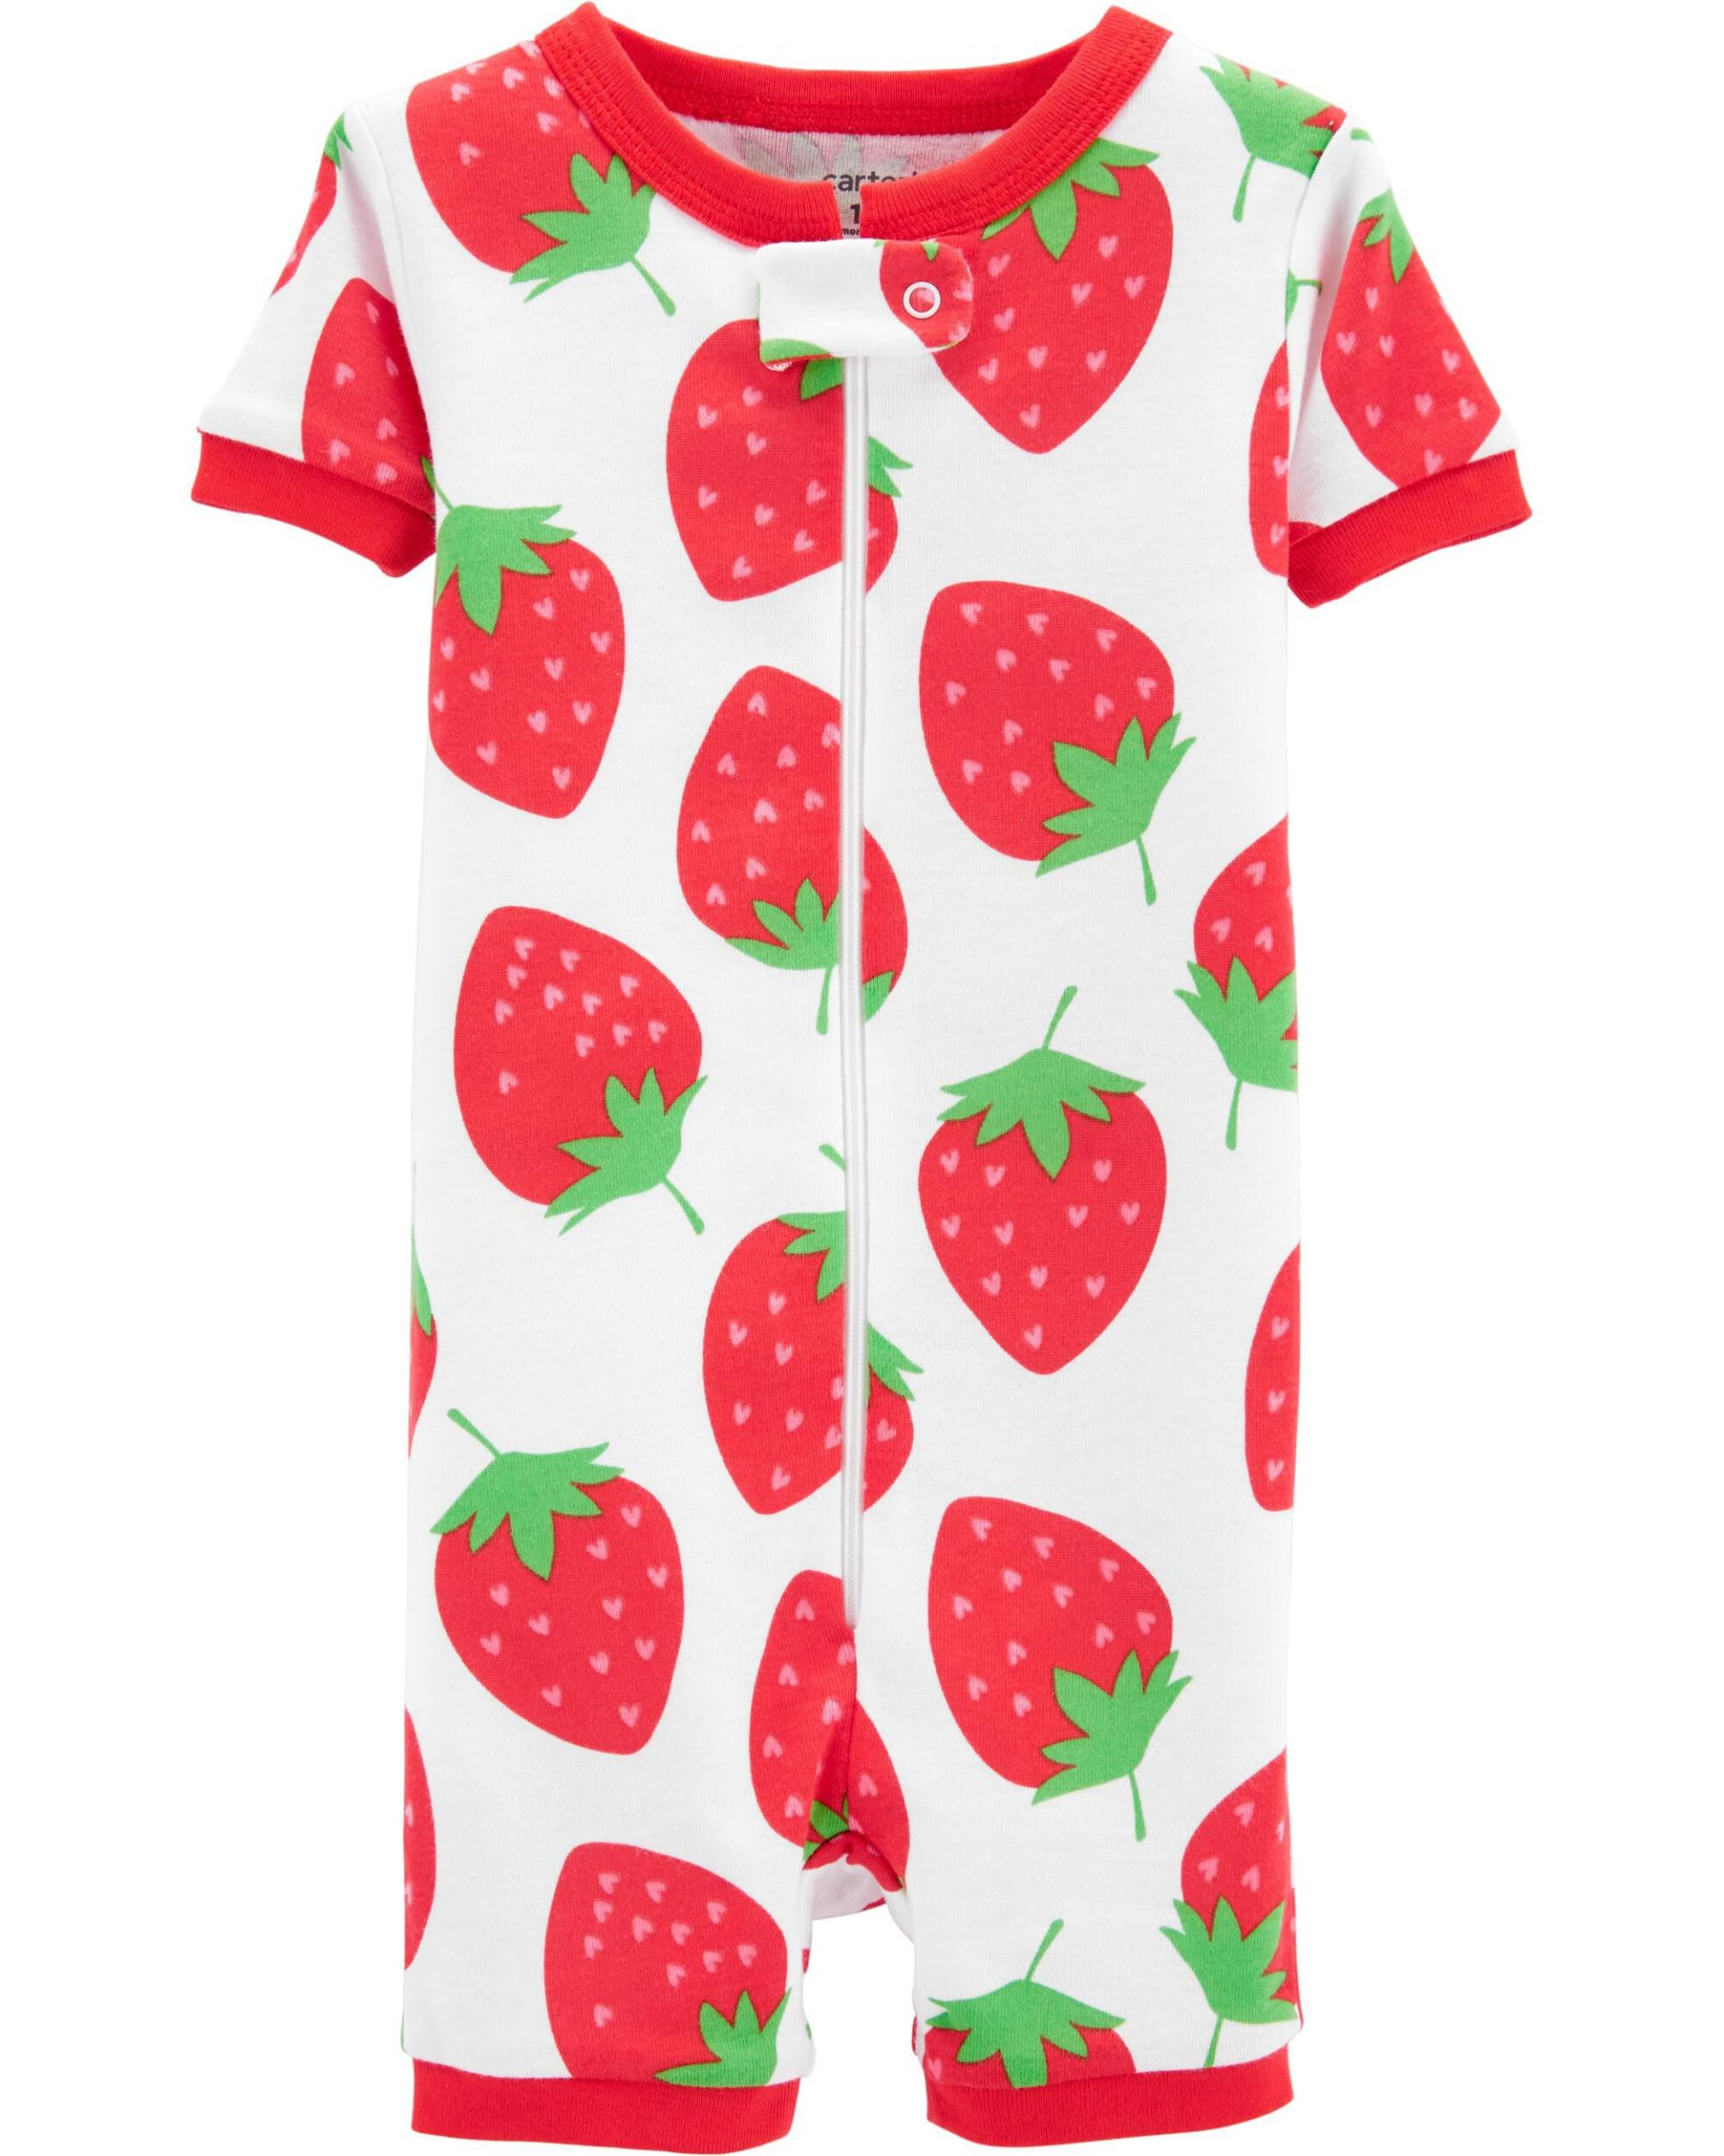 1-Piece Strawberry Snug Fit Cotton Sleep Romper